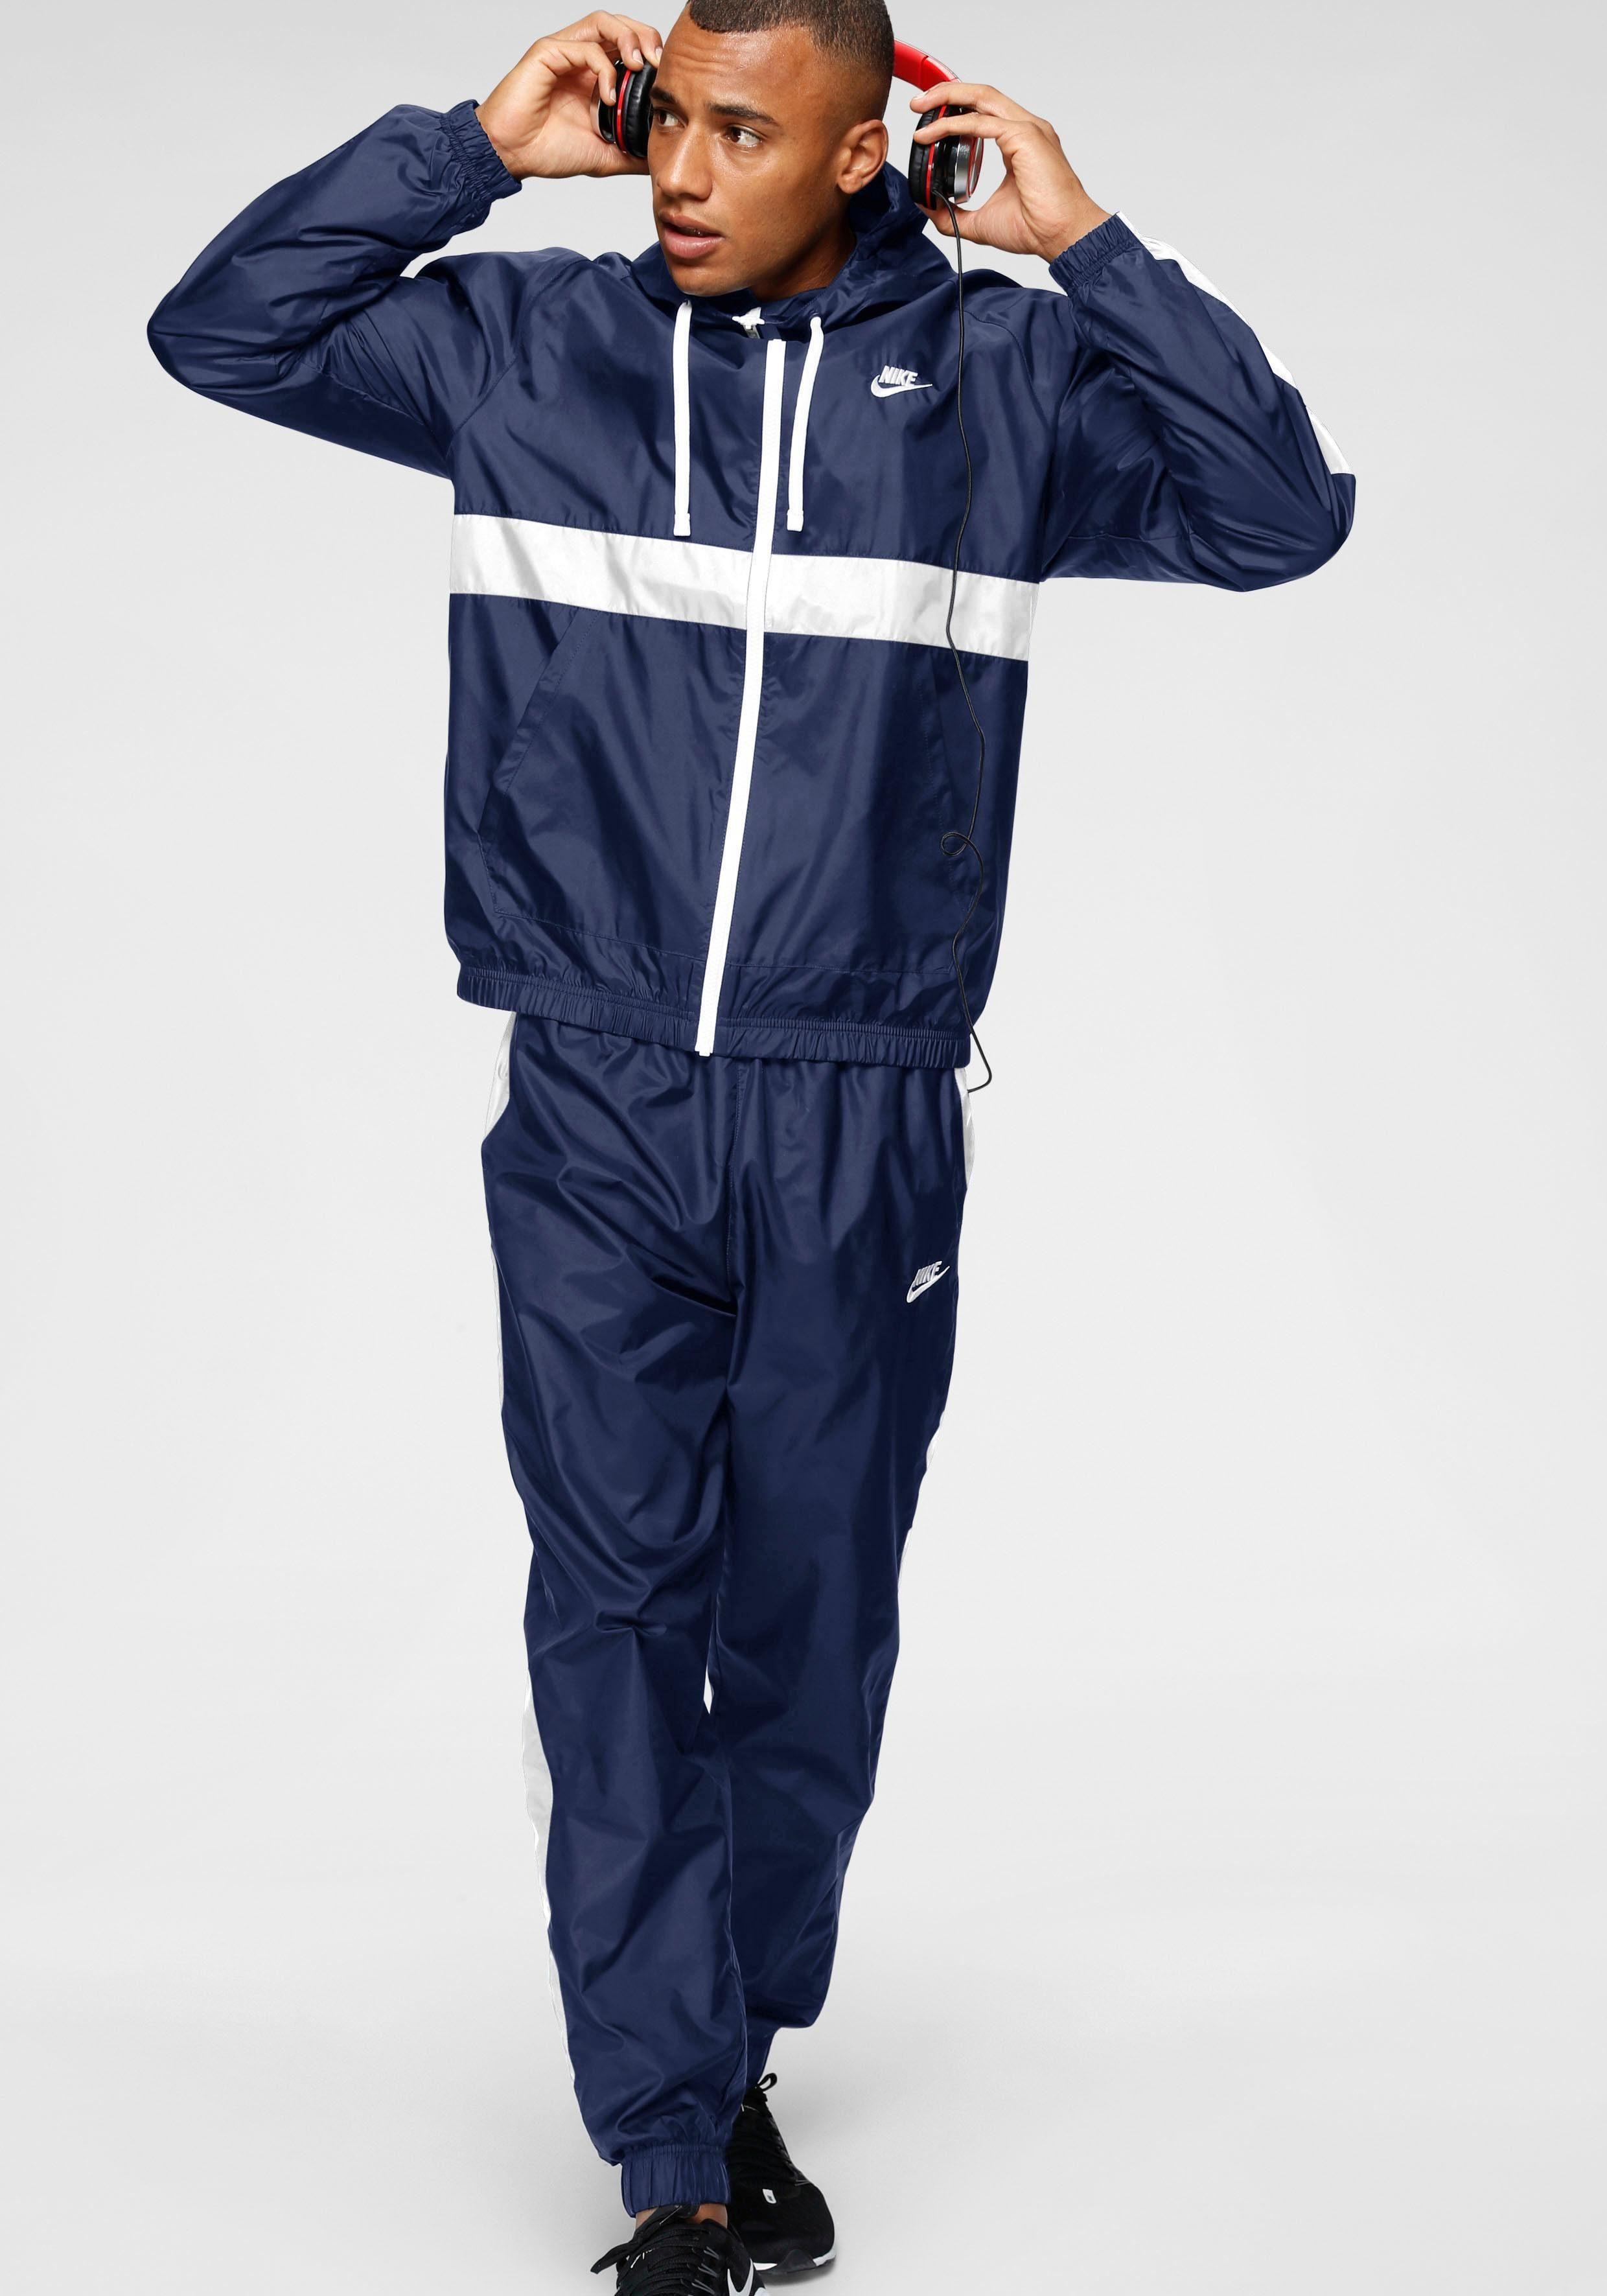 Nike Sportswear Trainingsanzug »M NSW CE TRK SUIT HD WVN« (Set, 2 tlg) online kaufen | OTTO